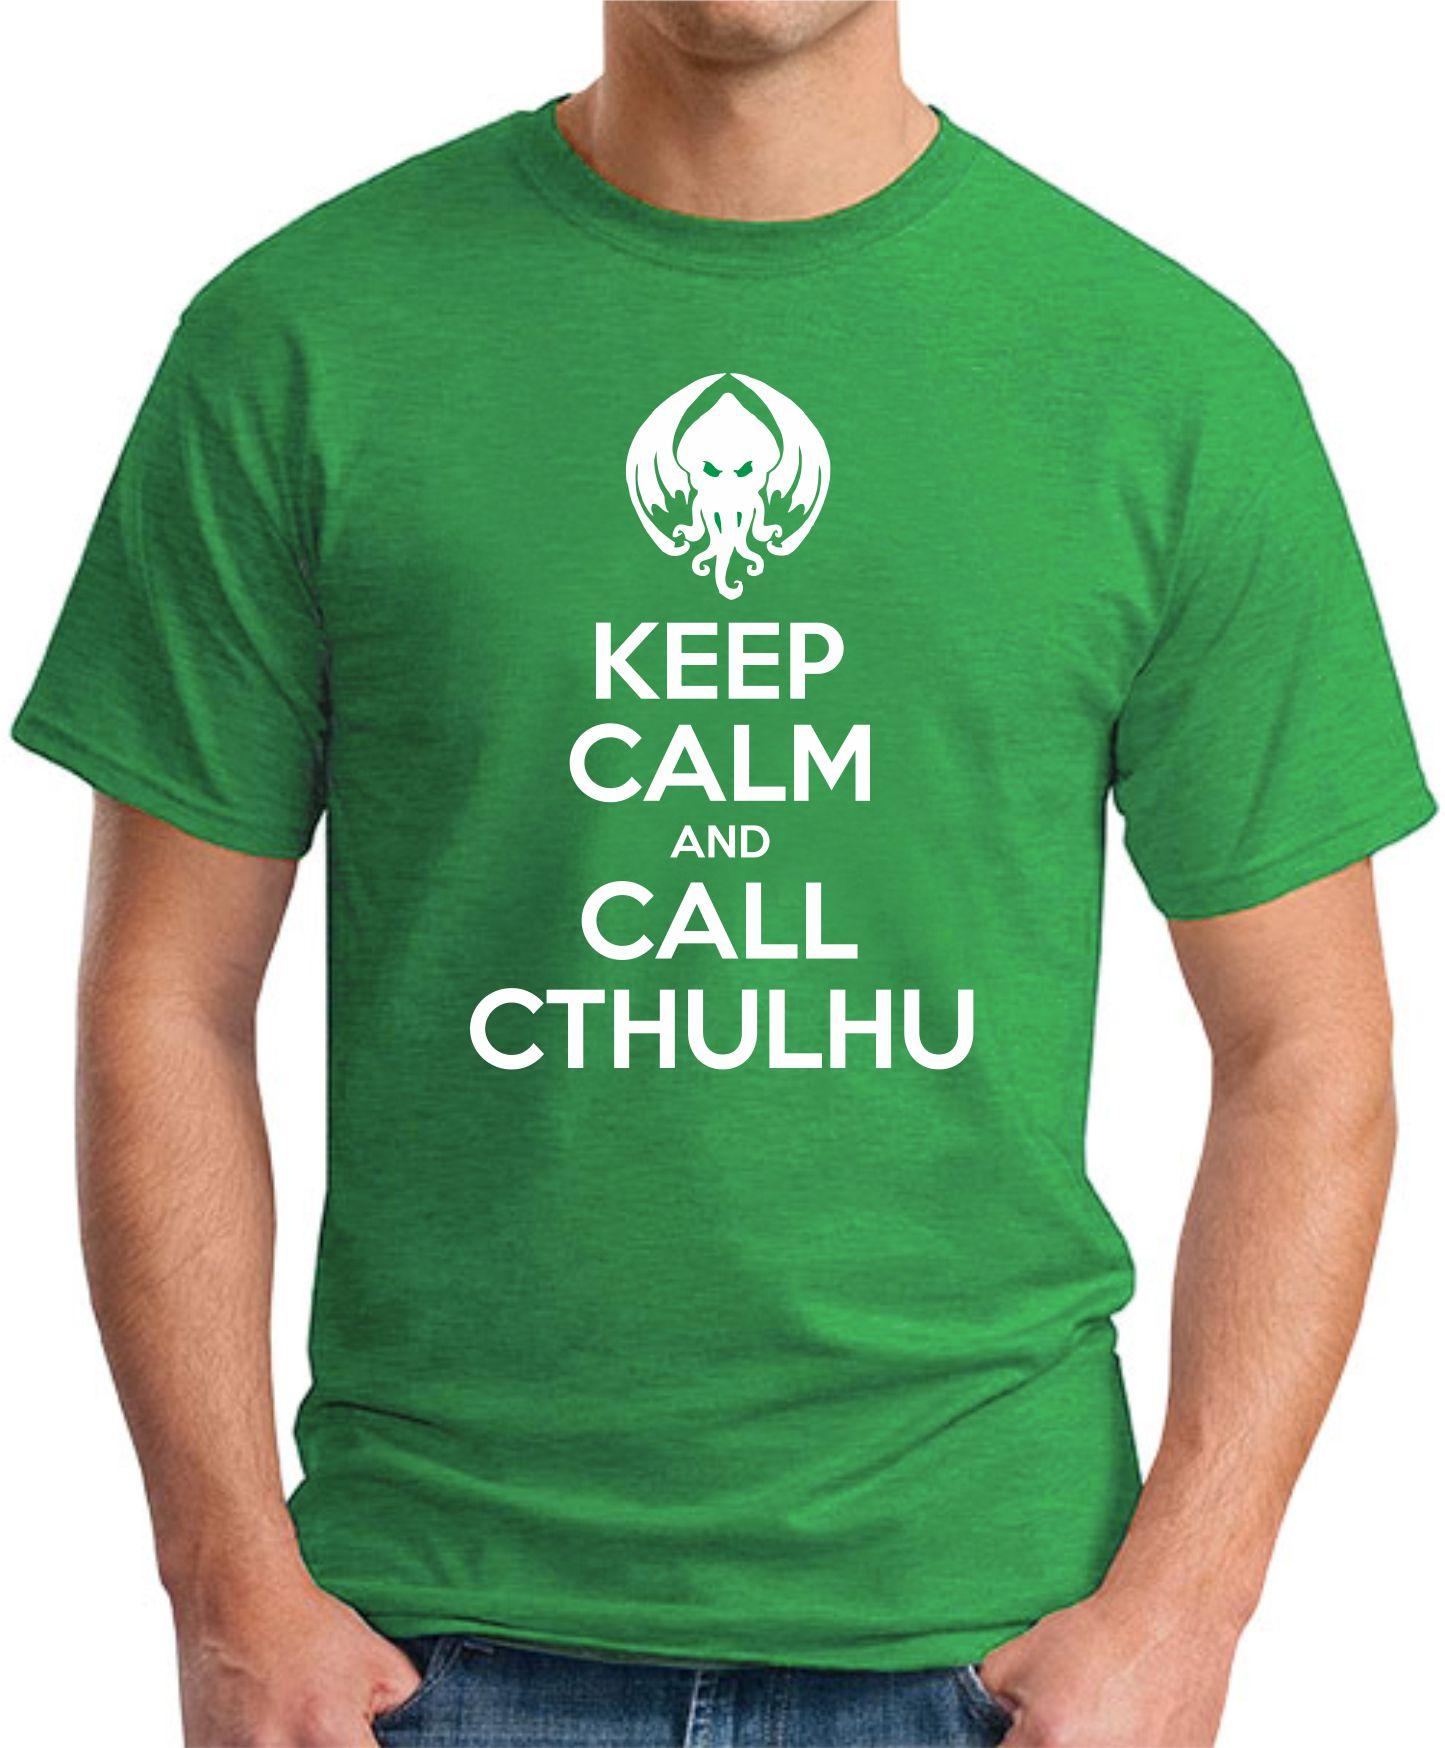 KEEP CALM AND CALL CTHULHU green